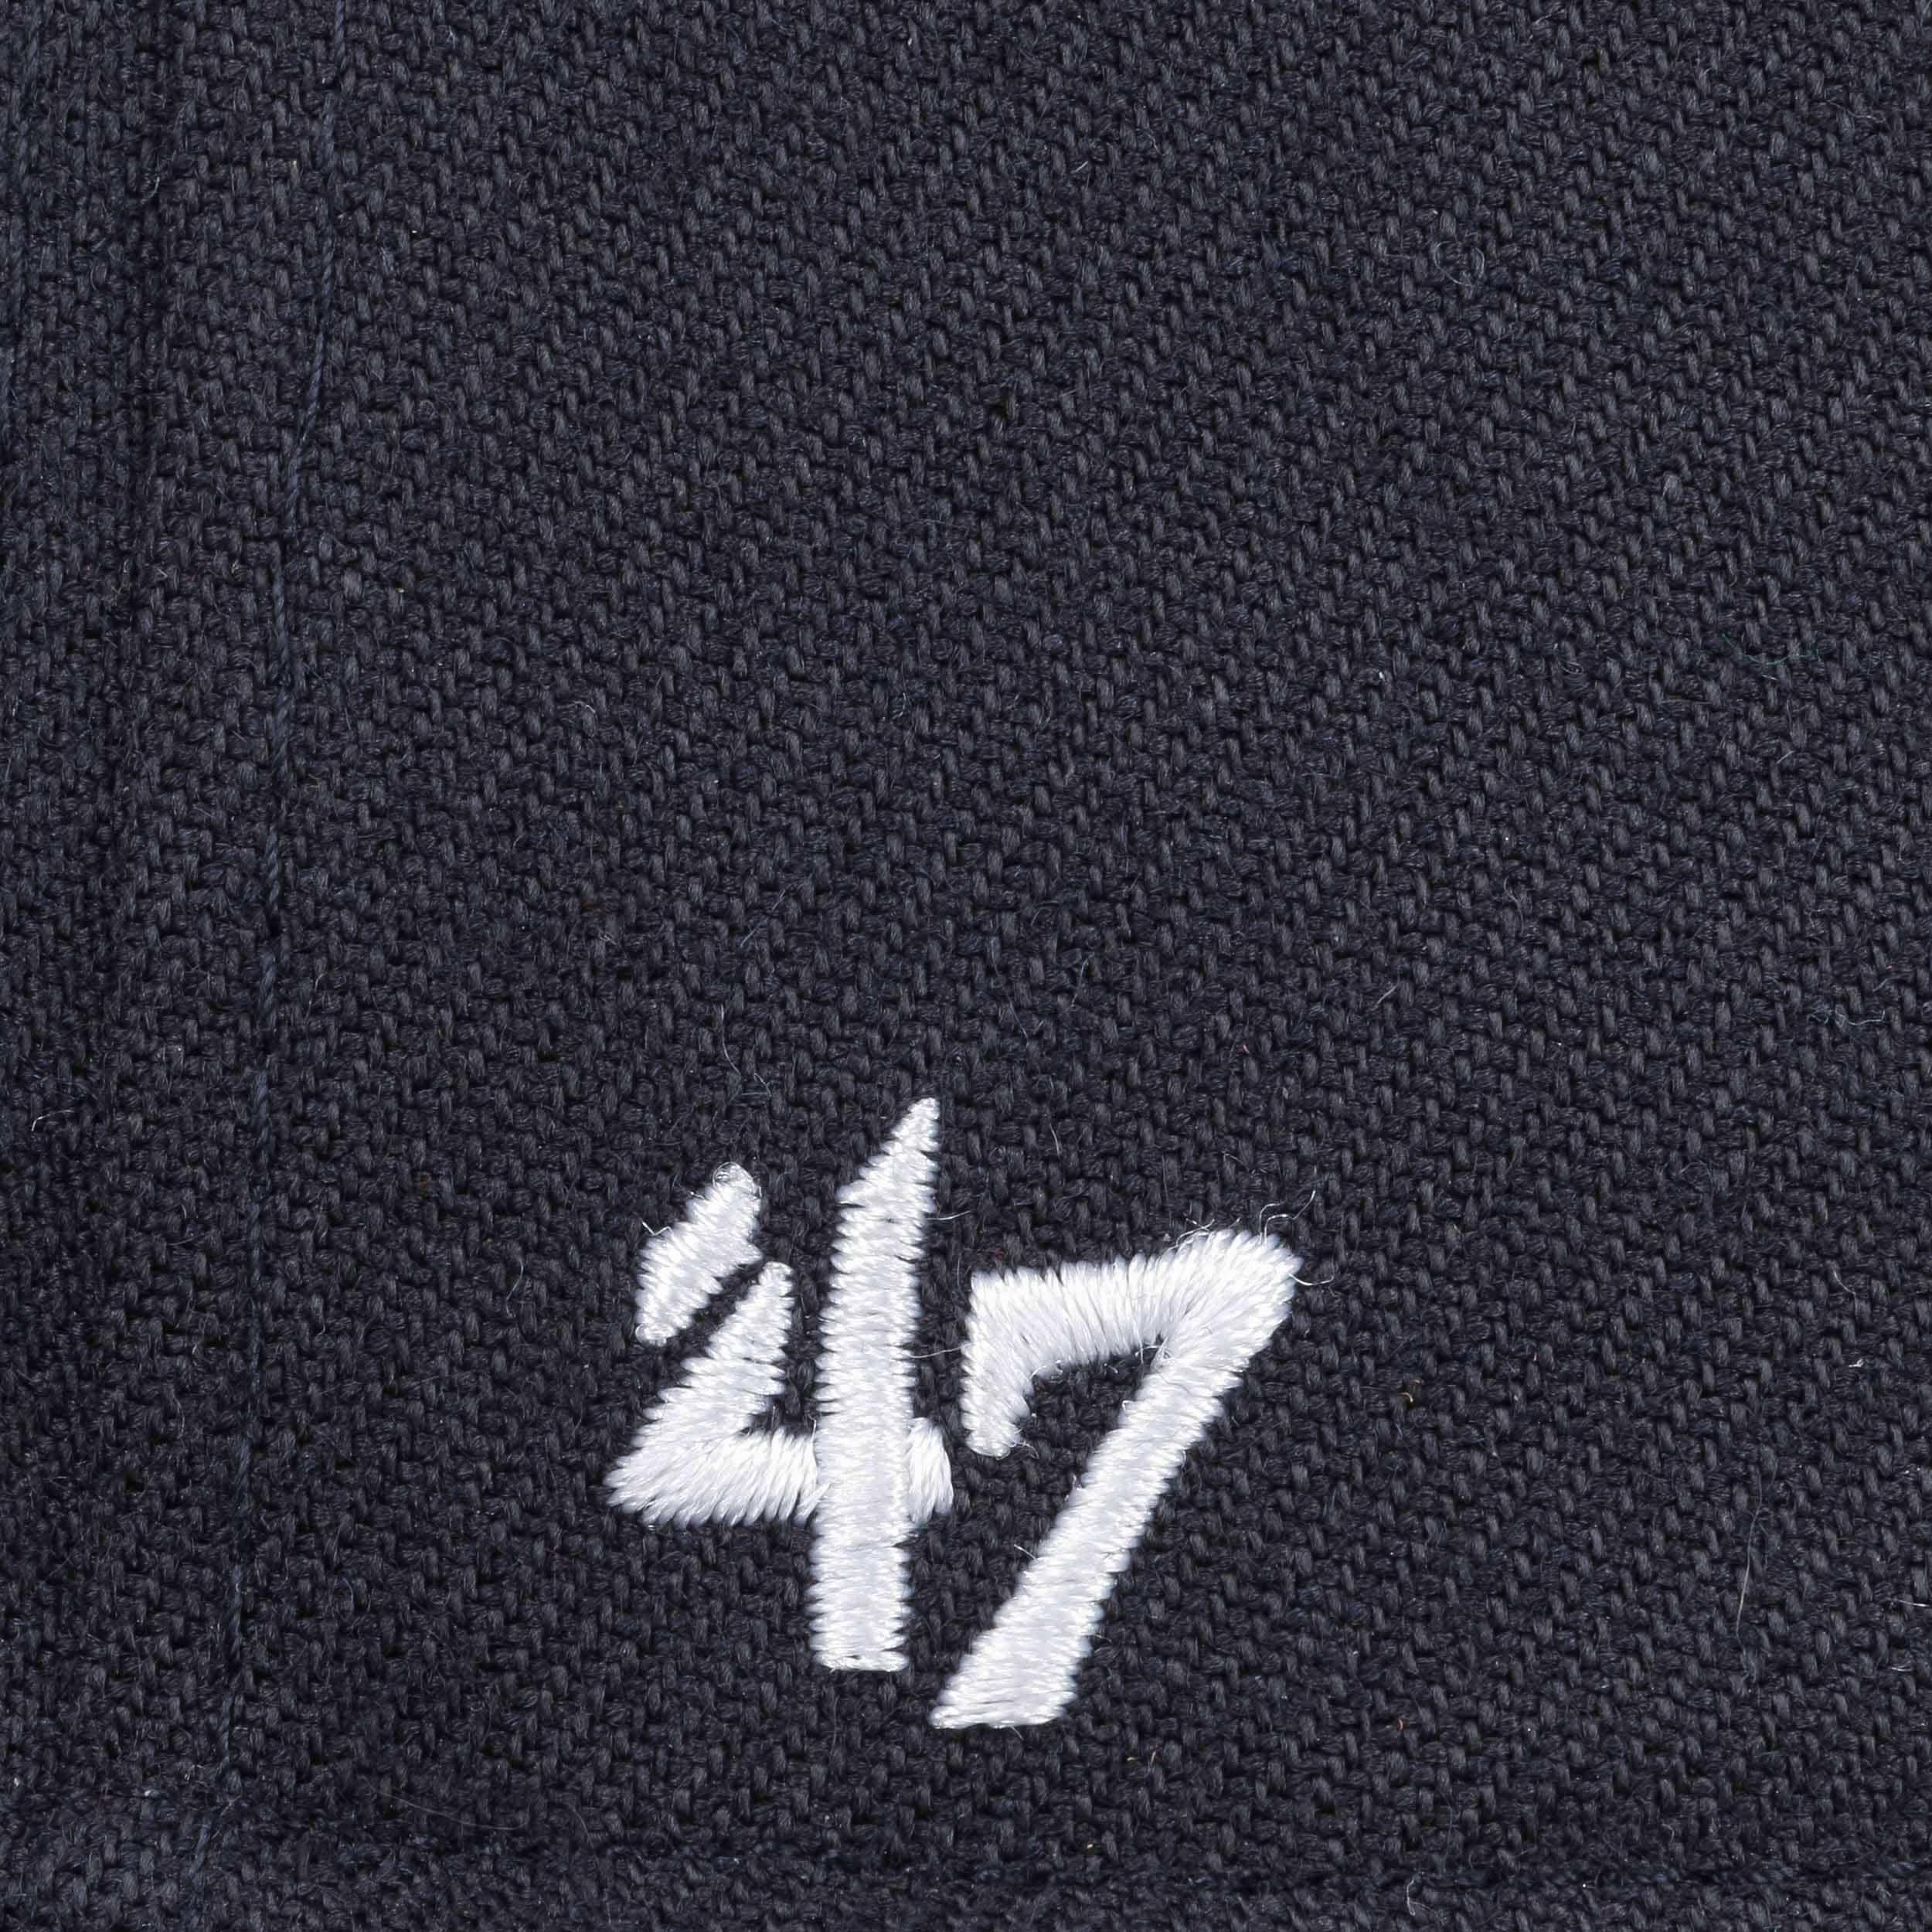 95e18b4cde2 ... NoShot Red Sox Snapback Cap by 47 Brand - navy 6